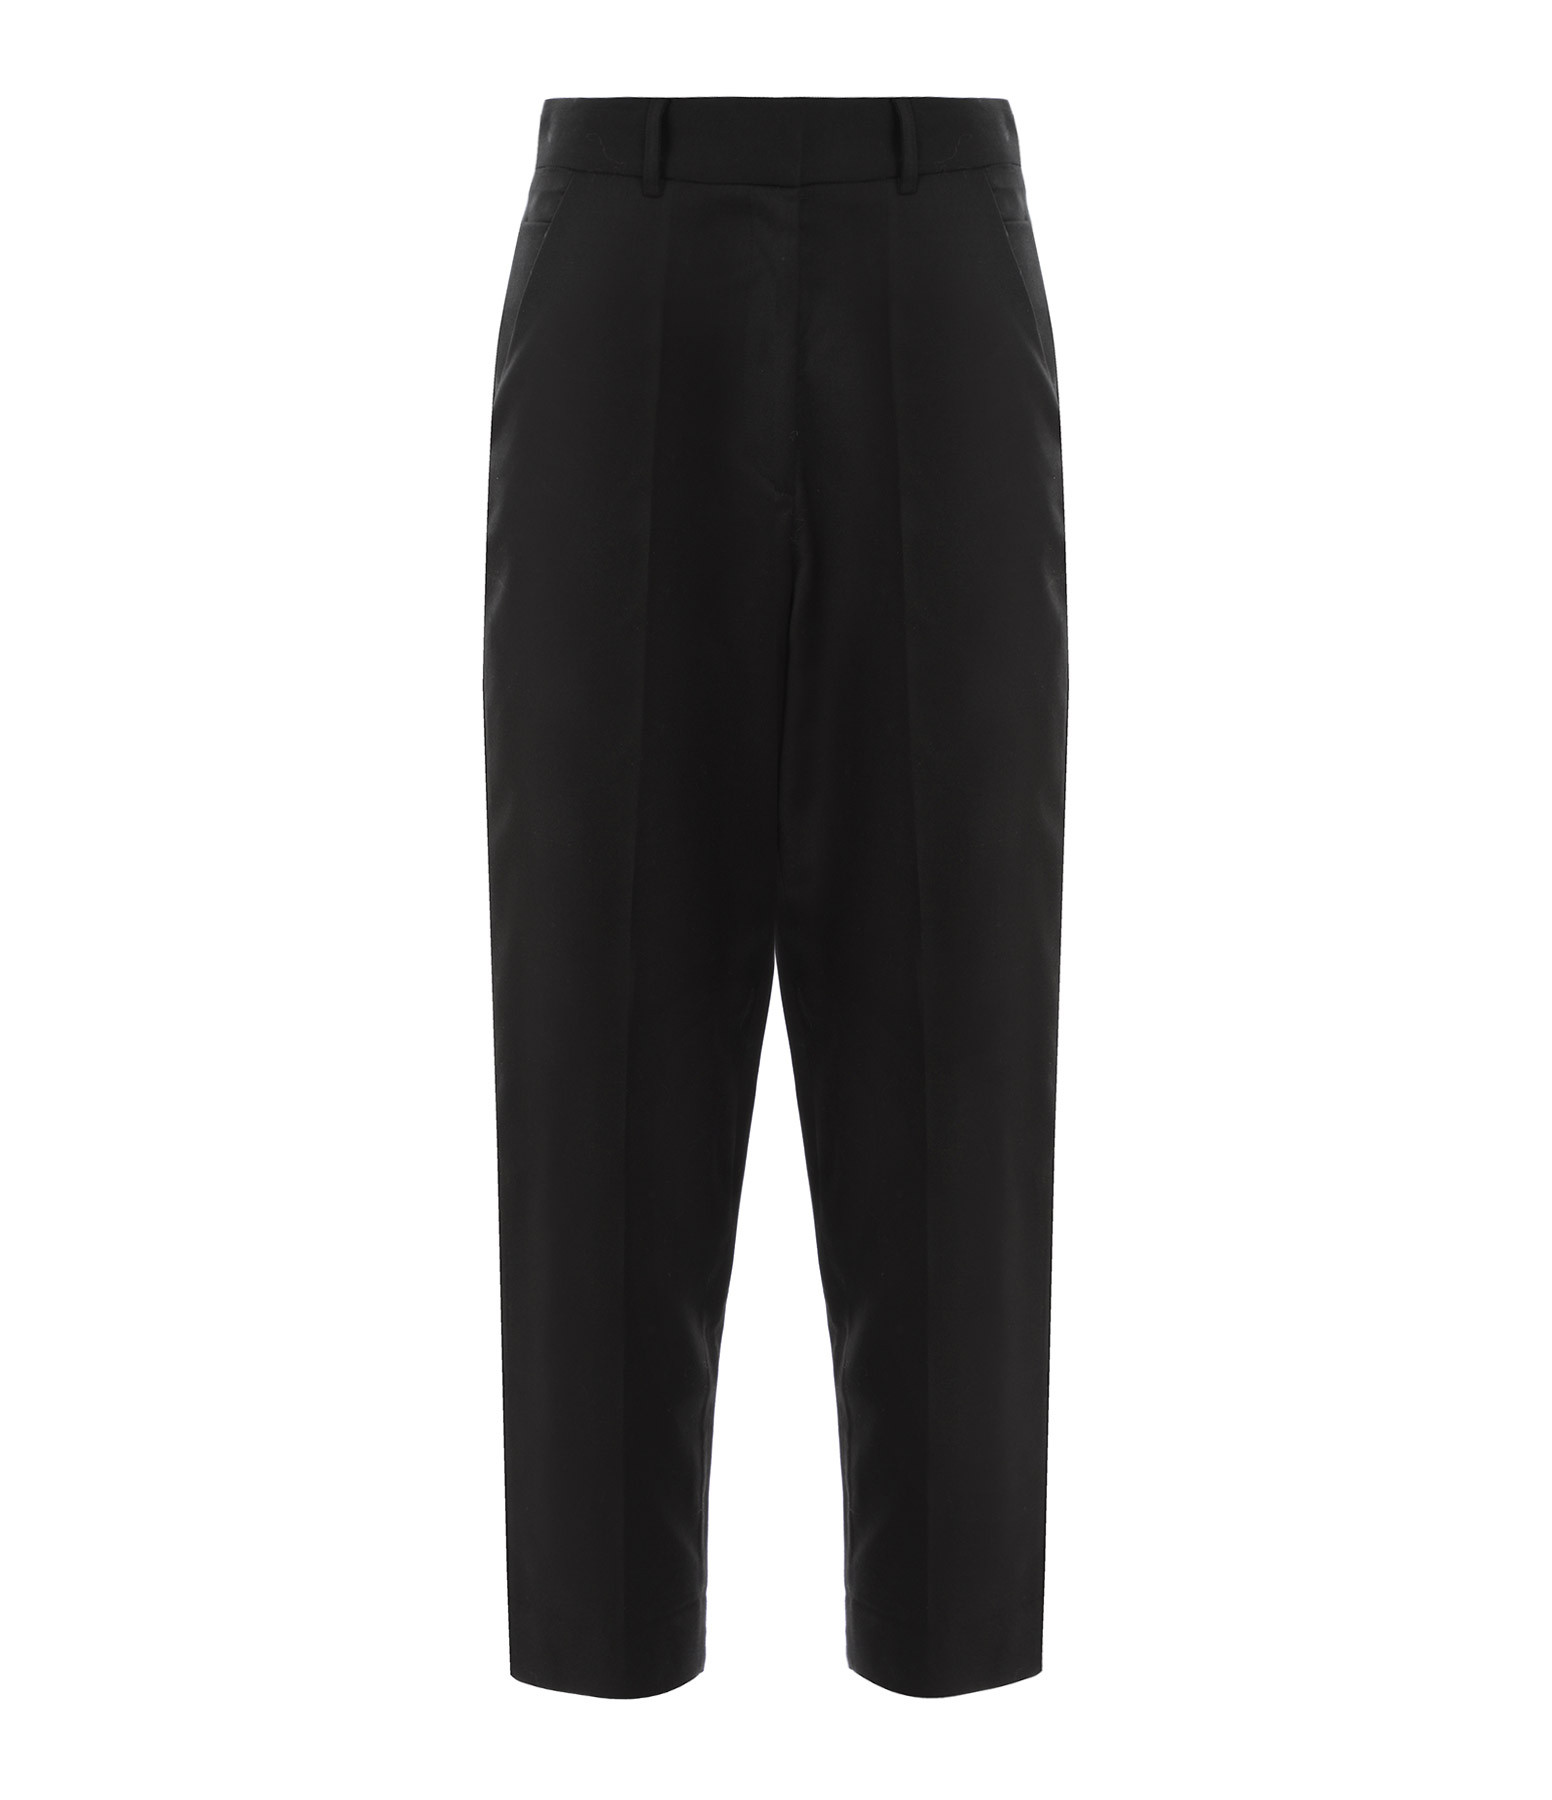 MARGAUX LONNBERG - Pantalon Anatole Noir